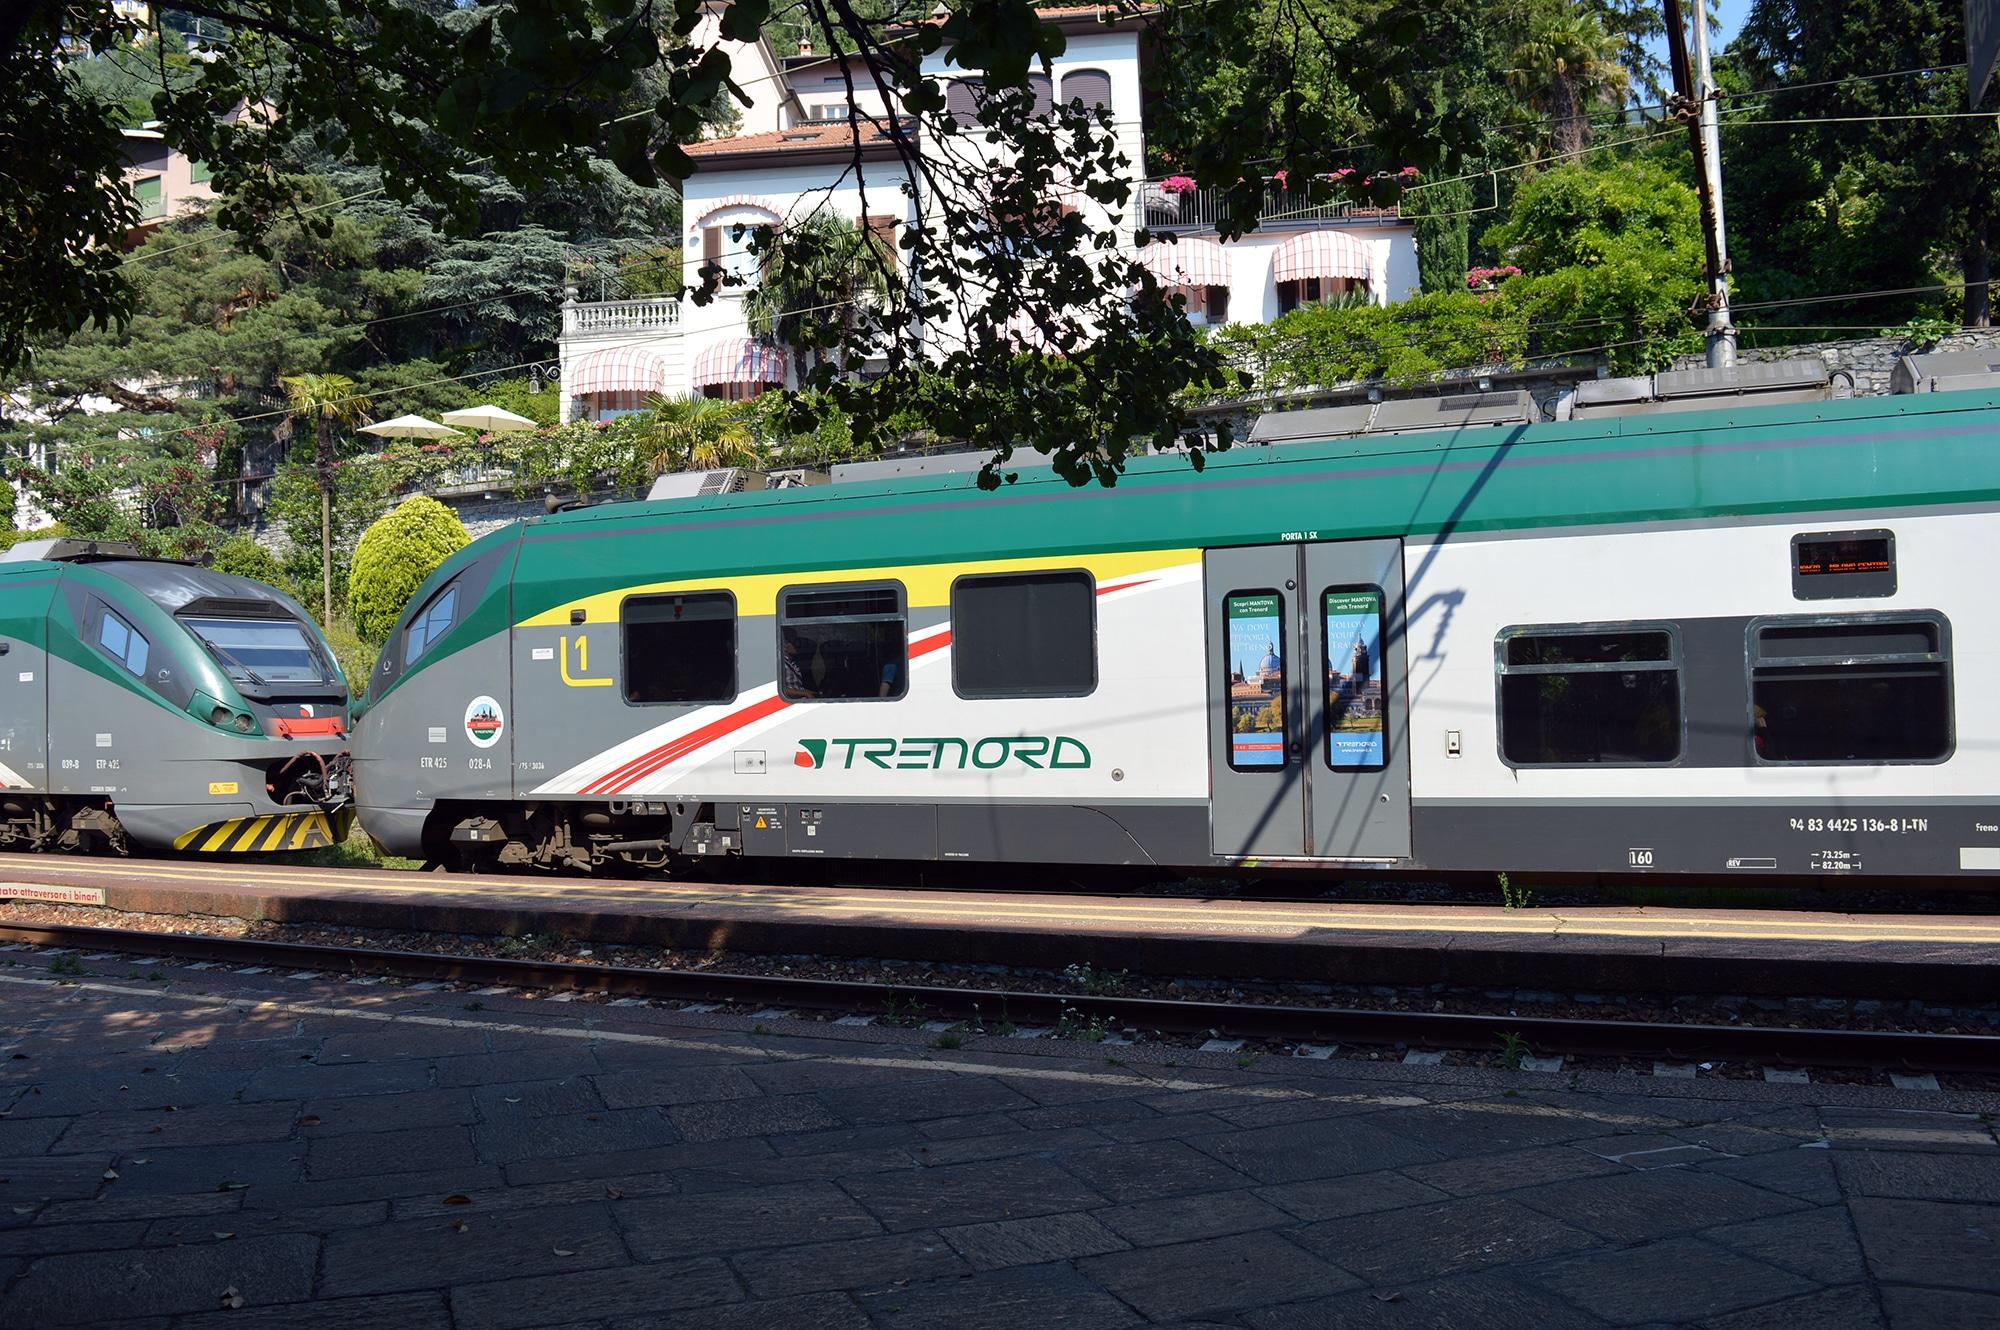 annuncio treno zingari